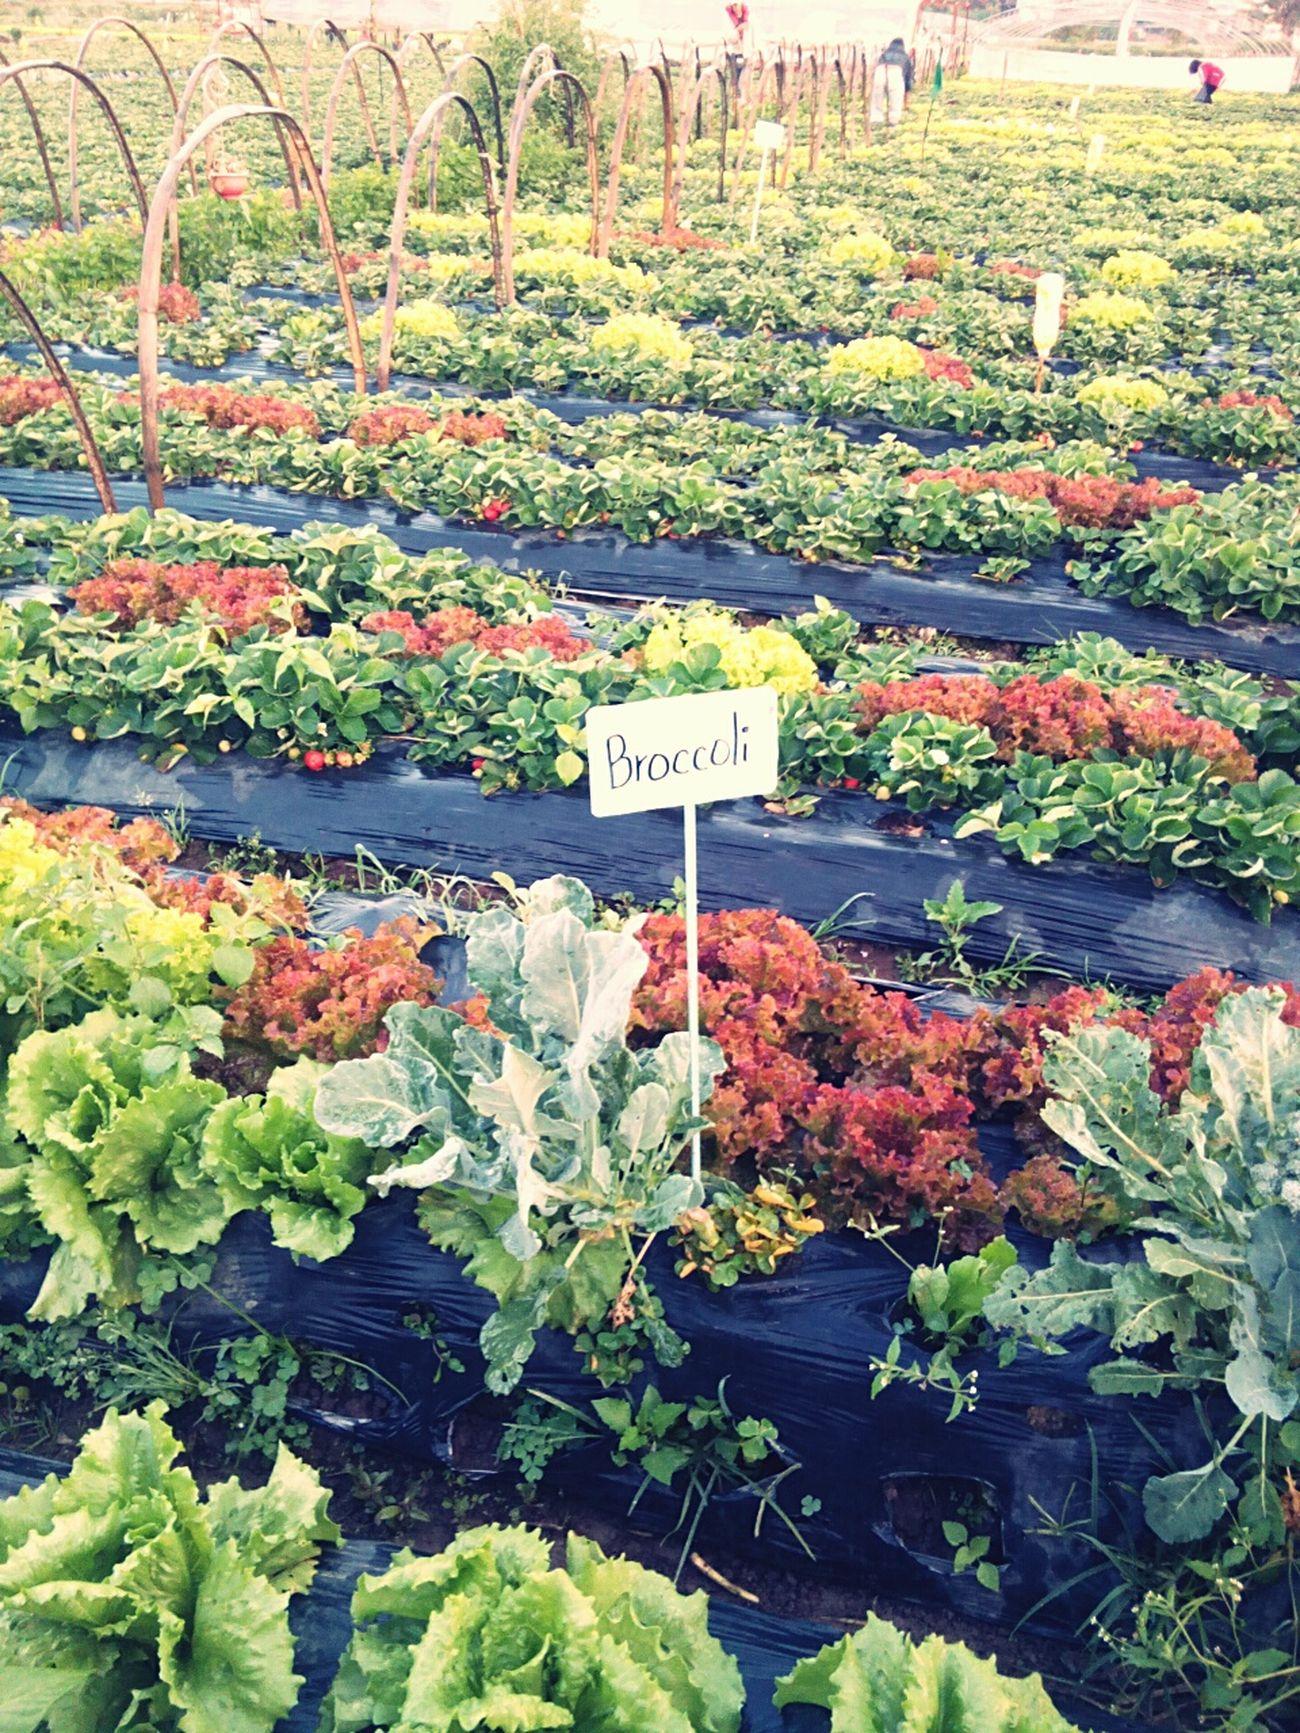 Farm Vegetables & Fruits Leafy Vegetable Colorful Leaves Farmlandscape Farmland